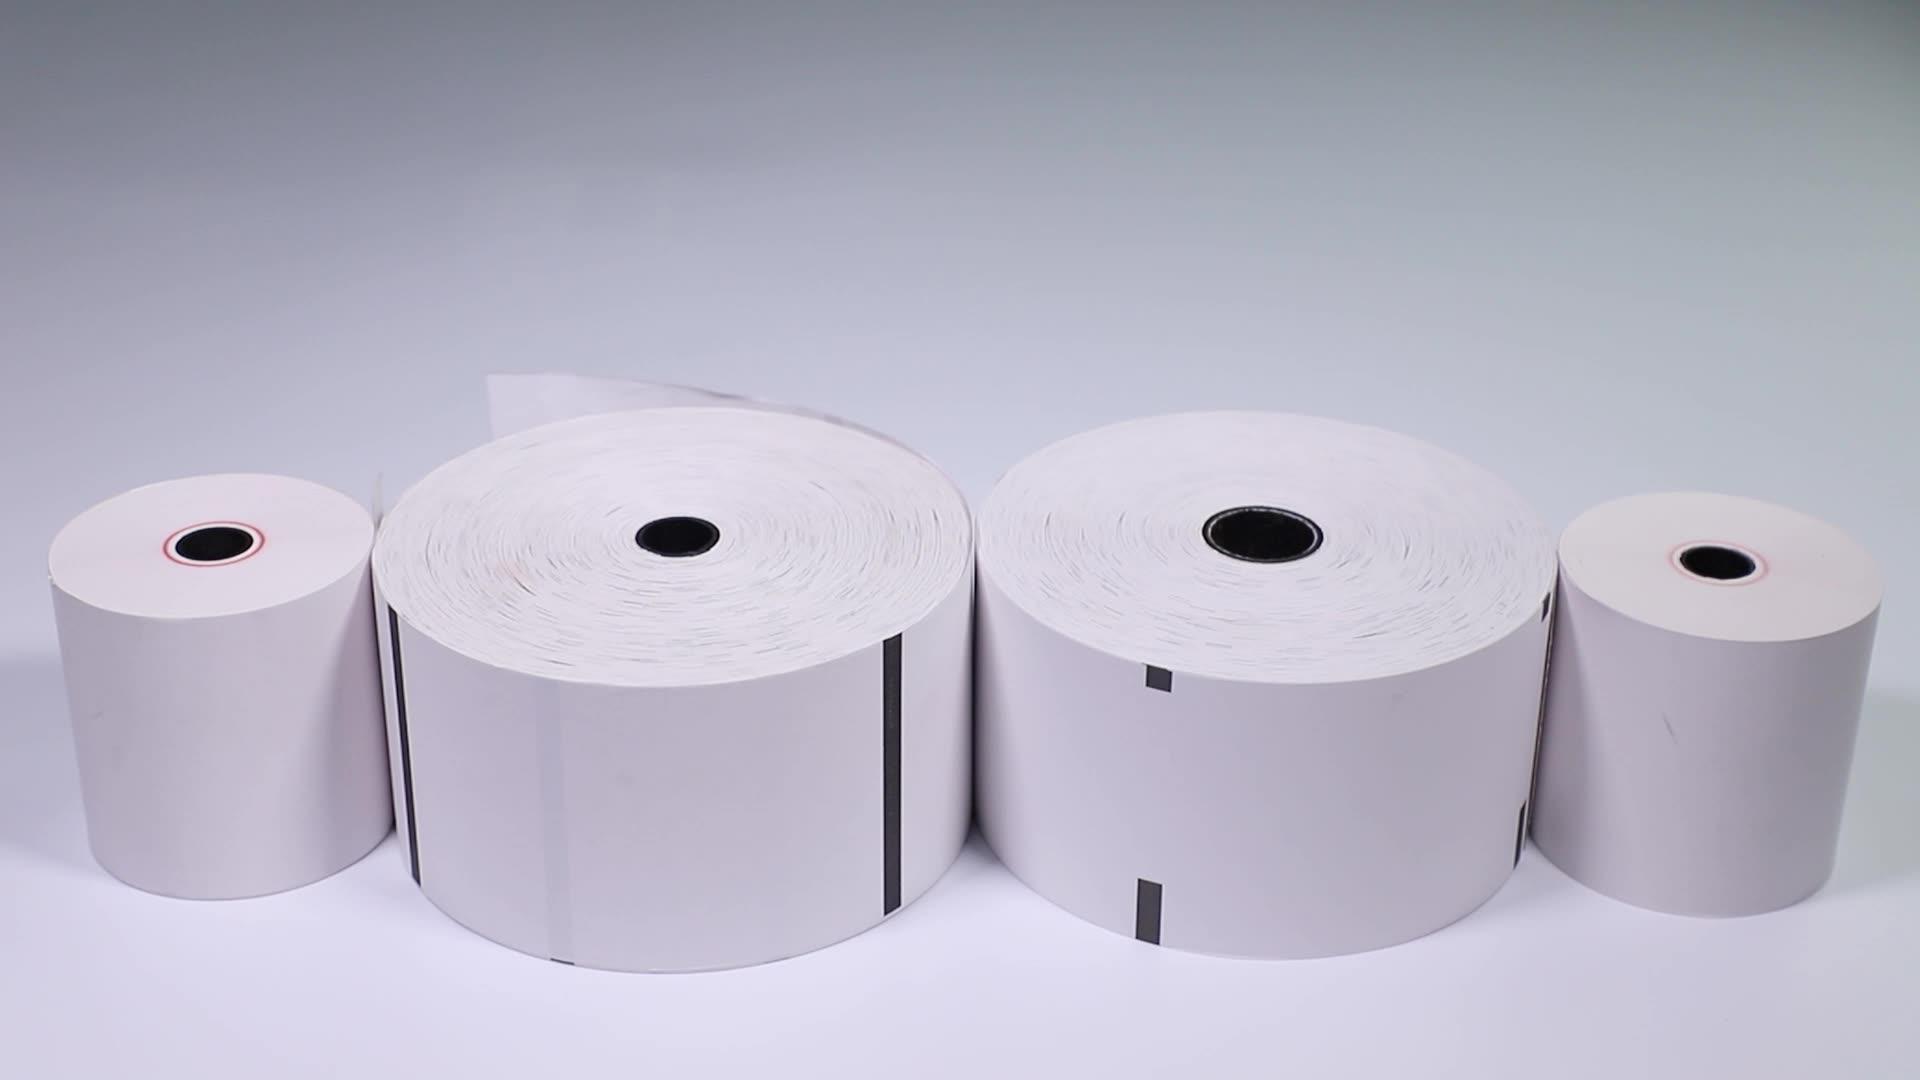 Kostenlose Probe 80mm 57mm Cash Register Bis Empfang Band Druck Papel Termico Pos Terminal Thermische Papier Rolle